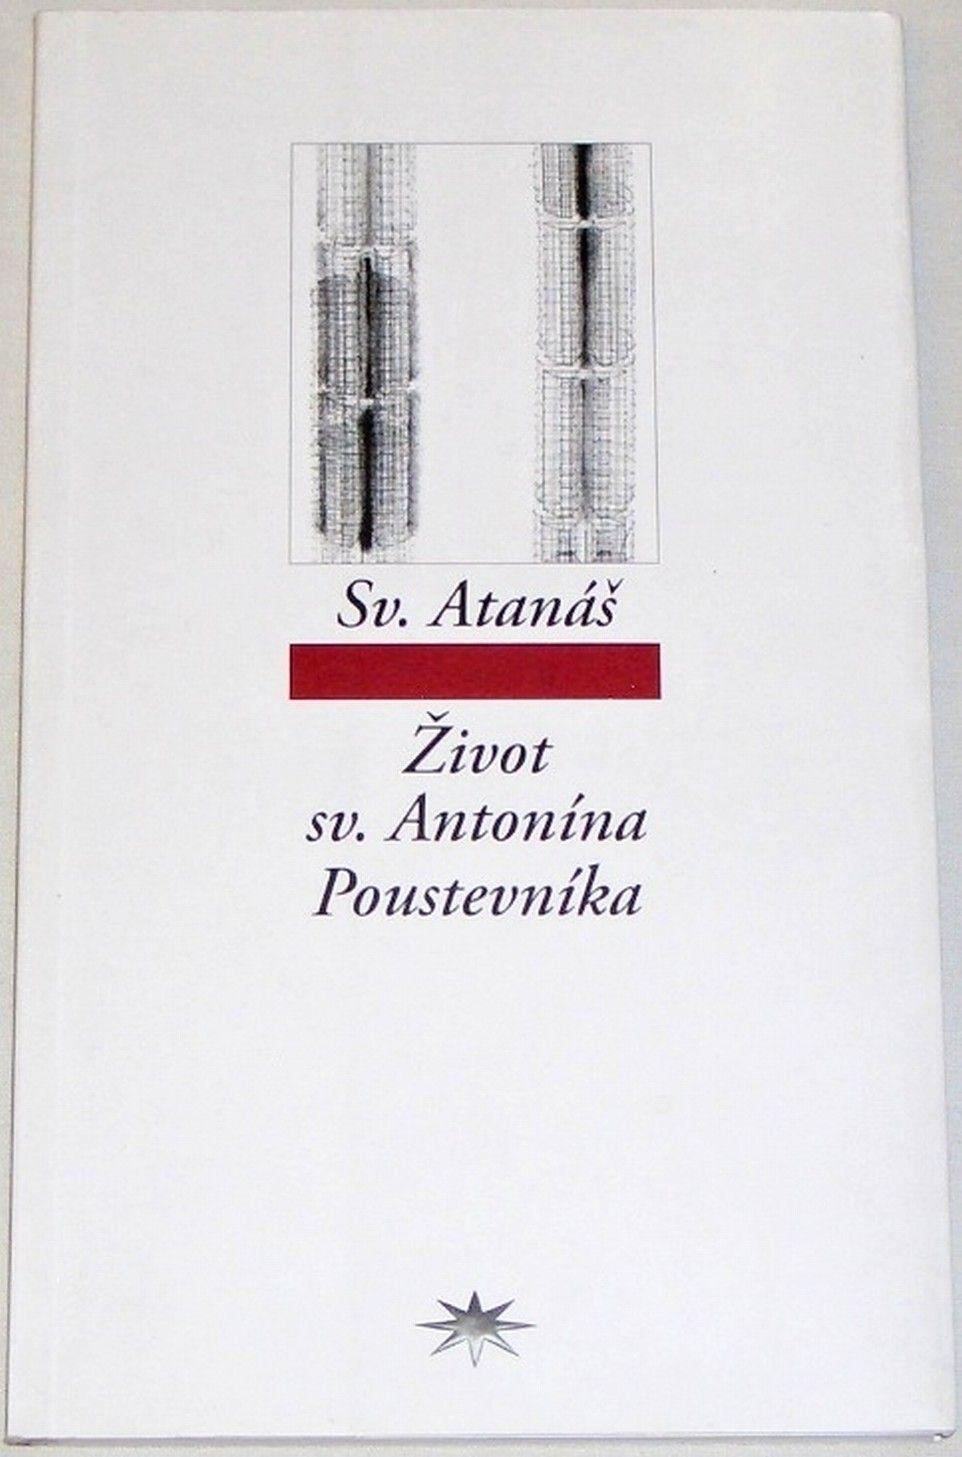 Sv. Atanáš - Život sv. Antonína Poustevníka